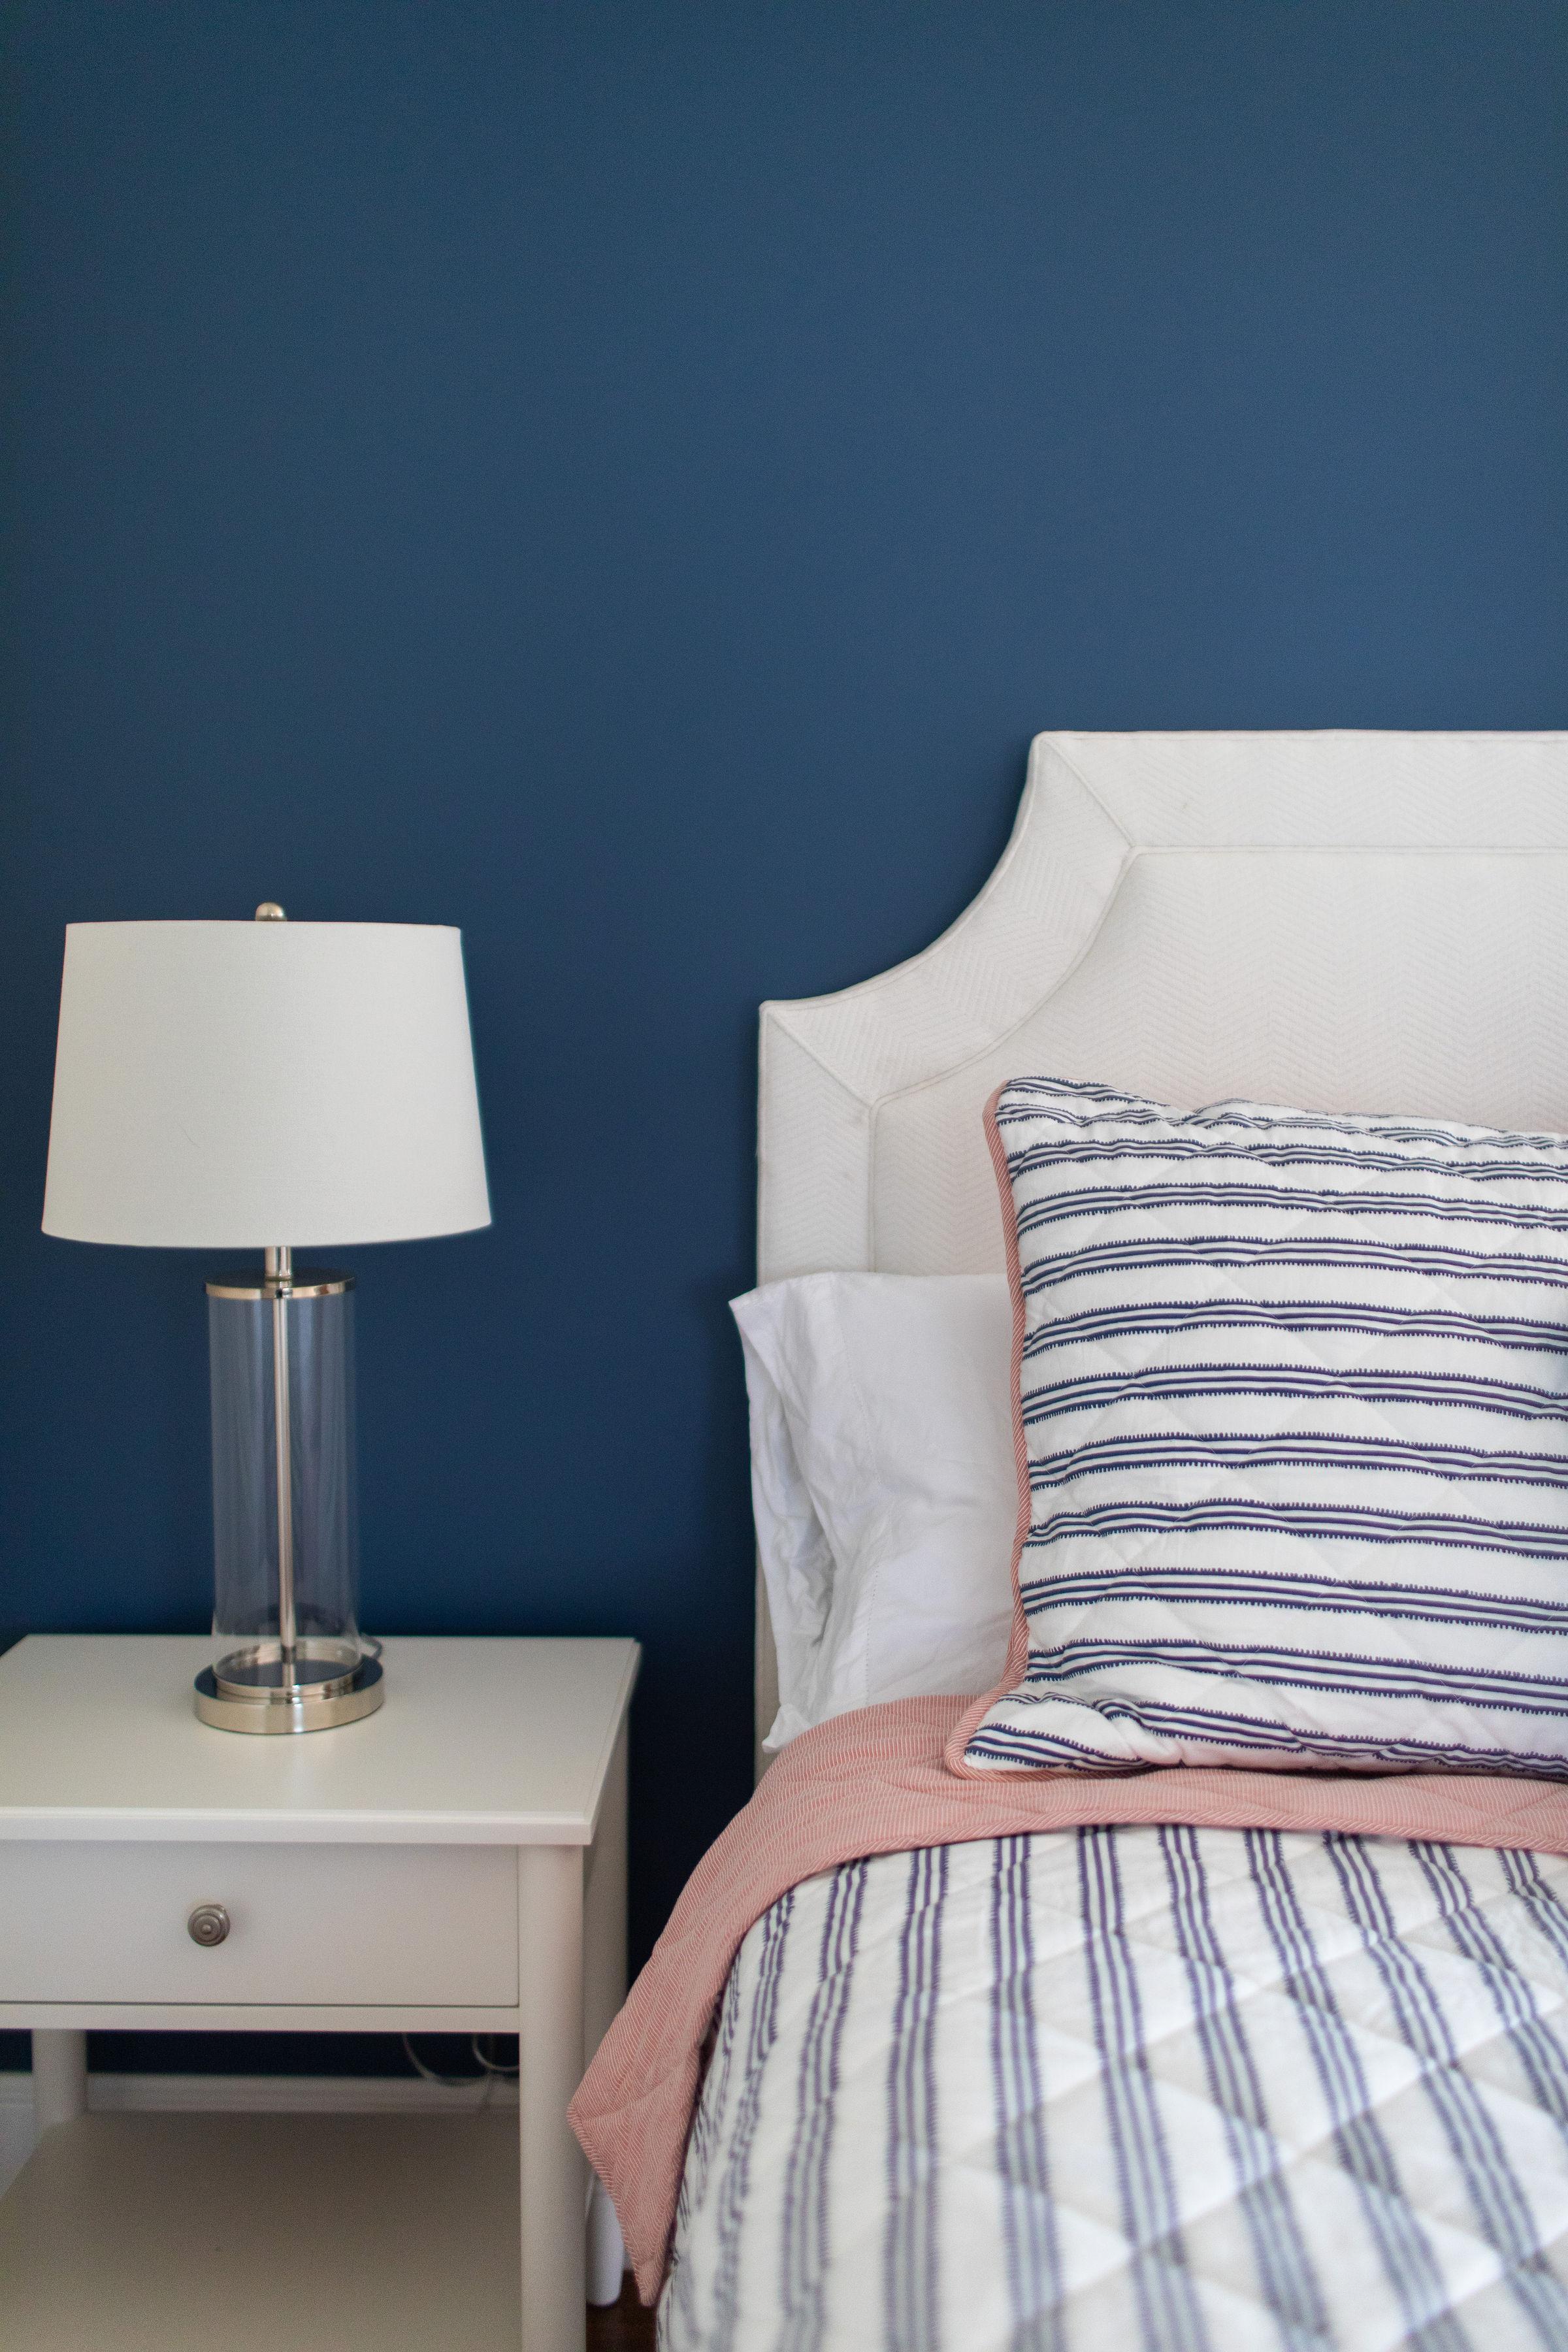 Guest bedroom design ideas, Skaneateles, NY interior designer